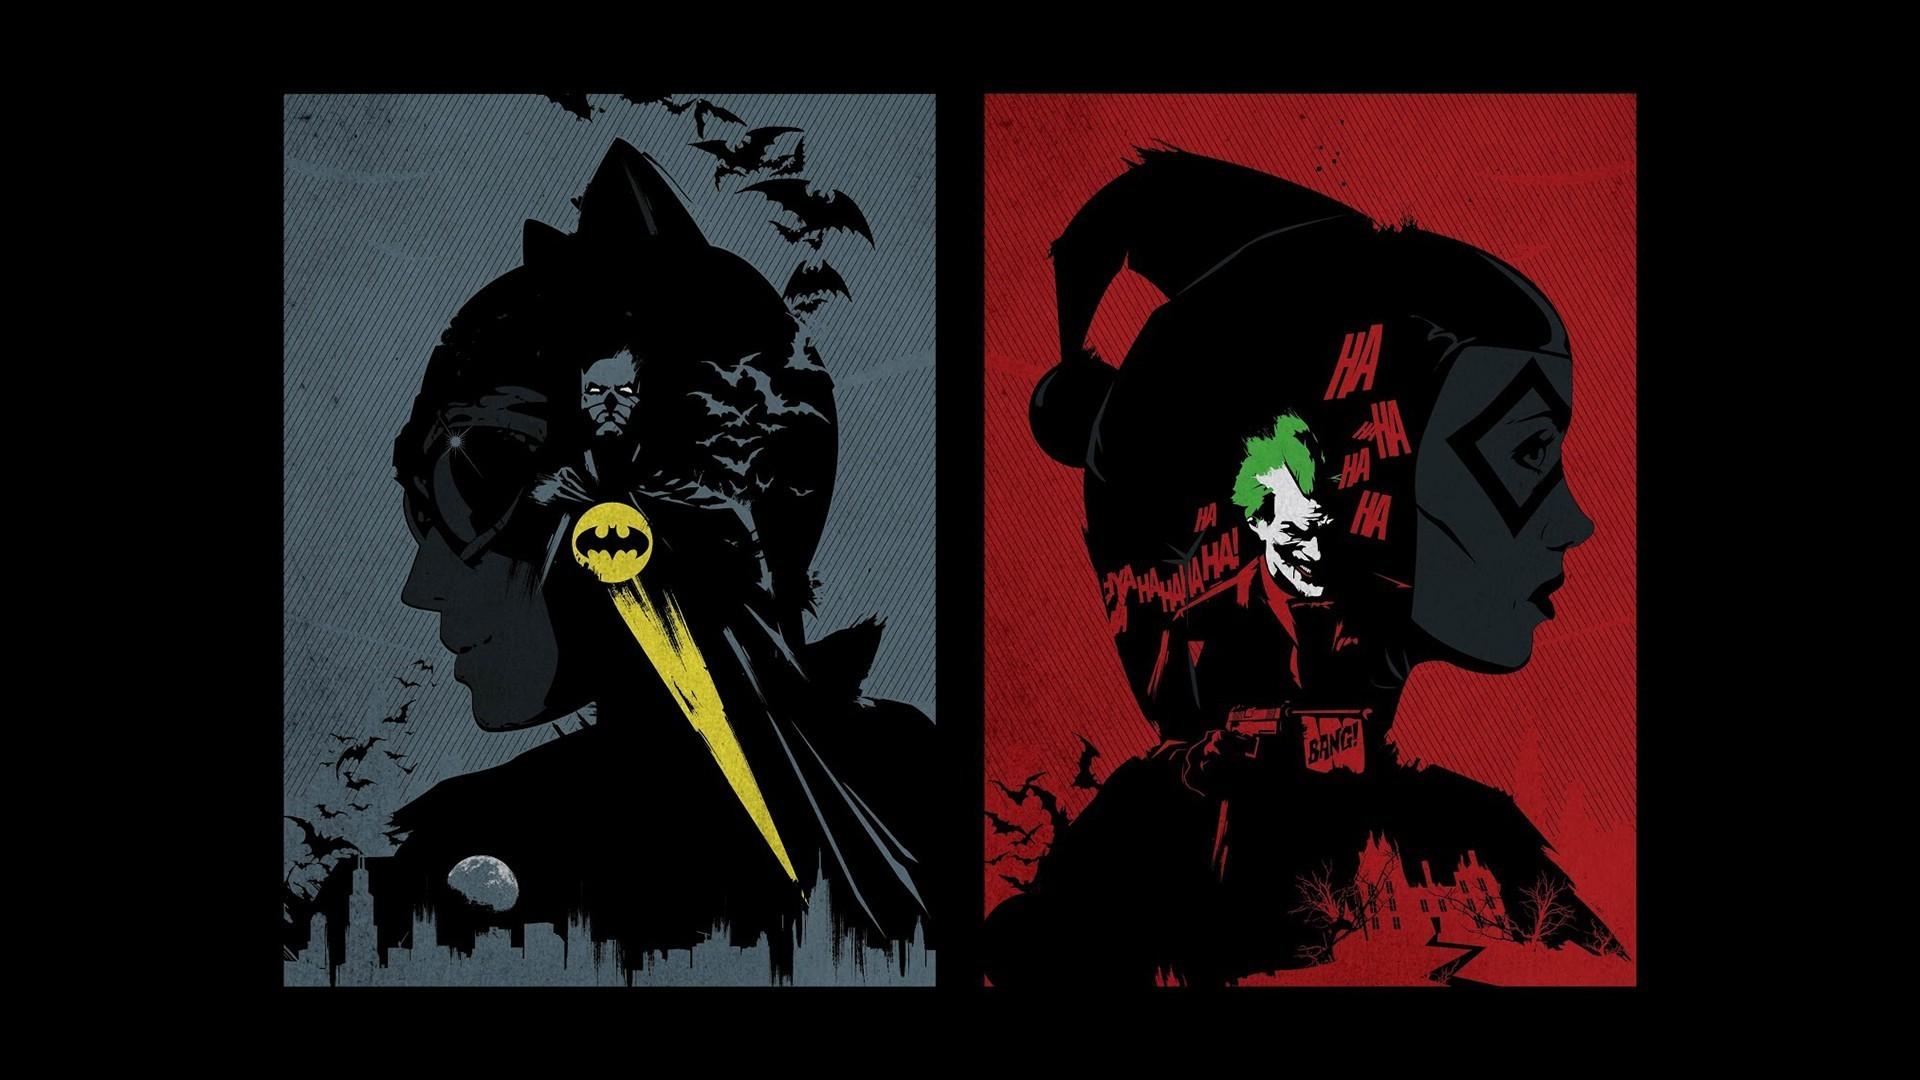 Suicide Squad Harley Quinn HD desktop wallpaper High Definition